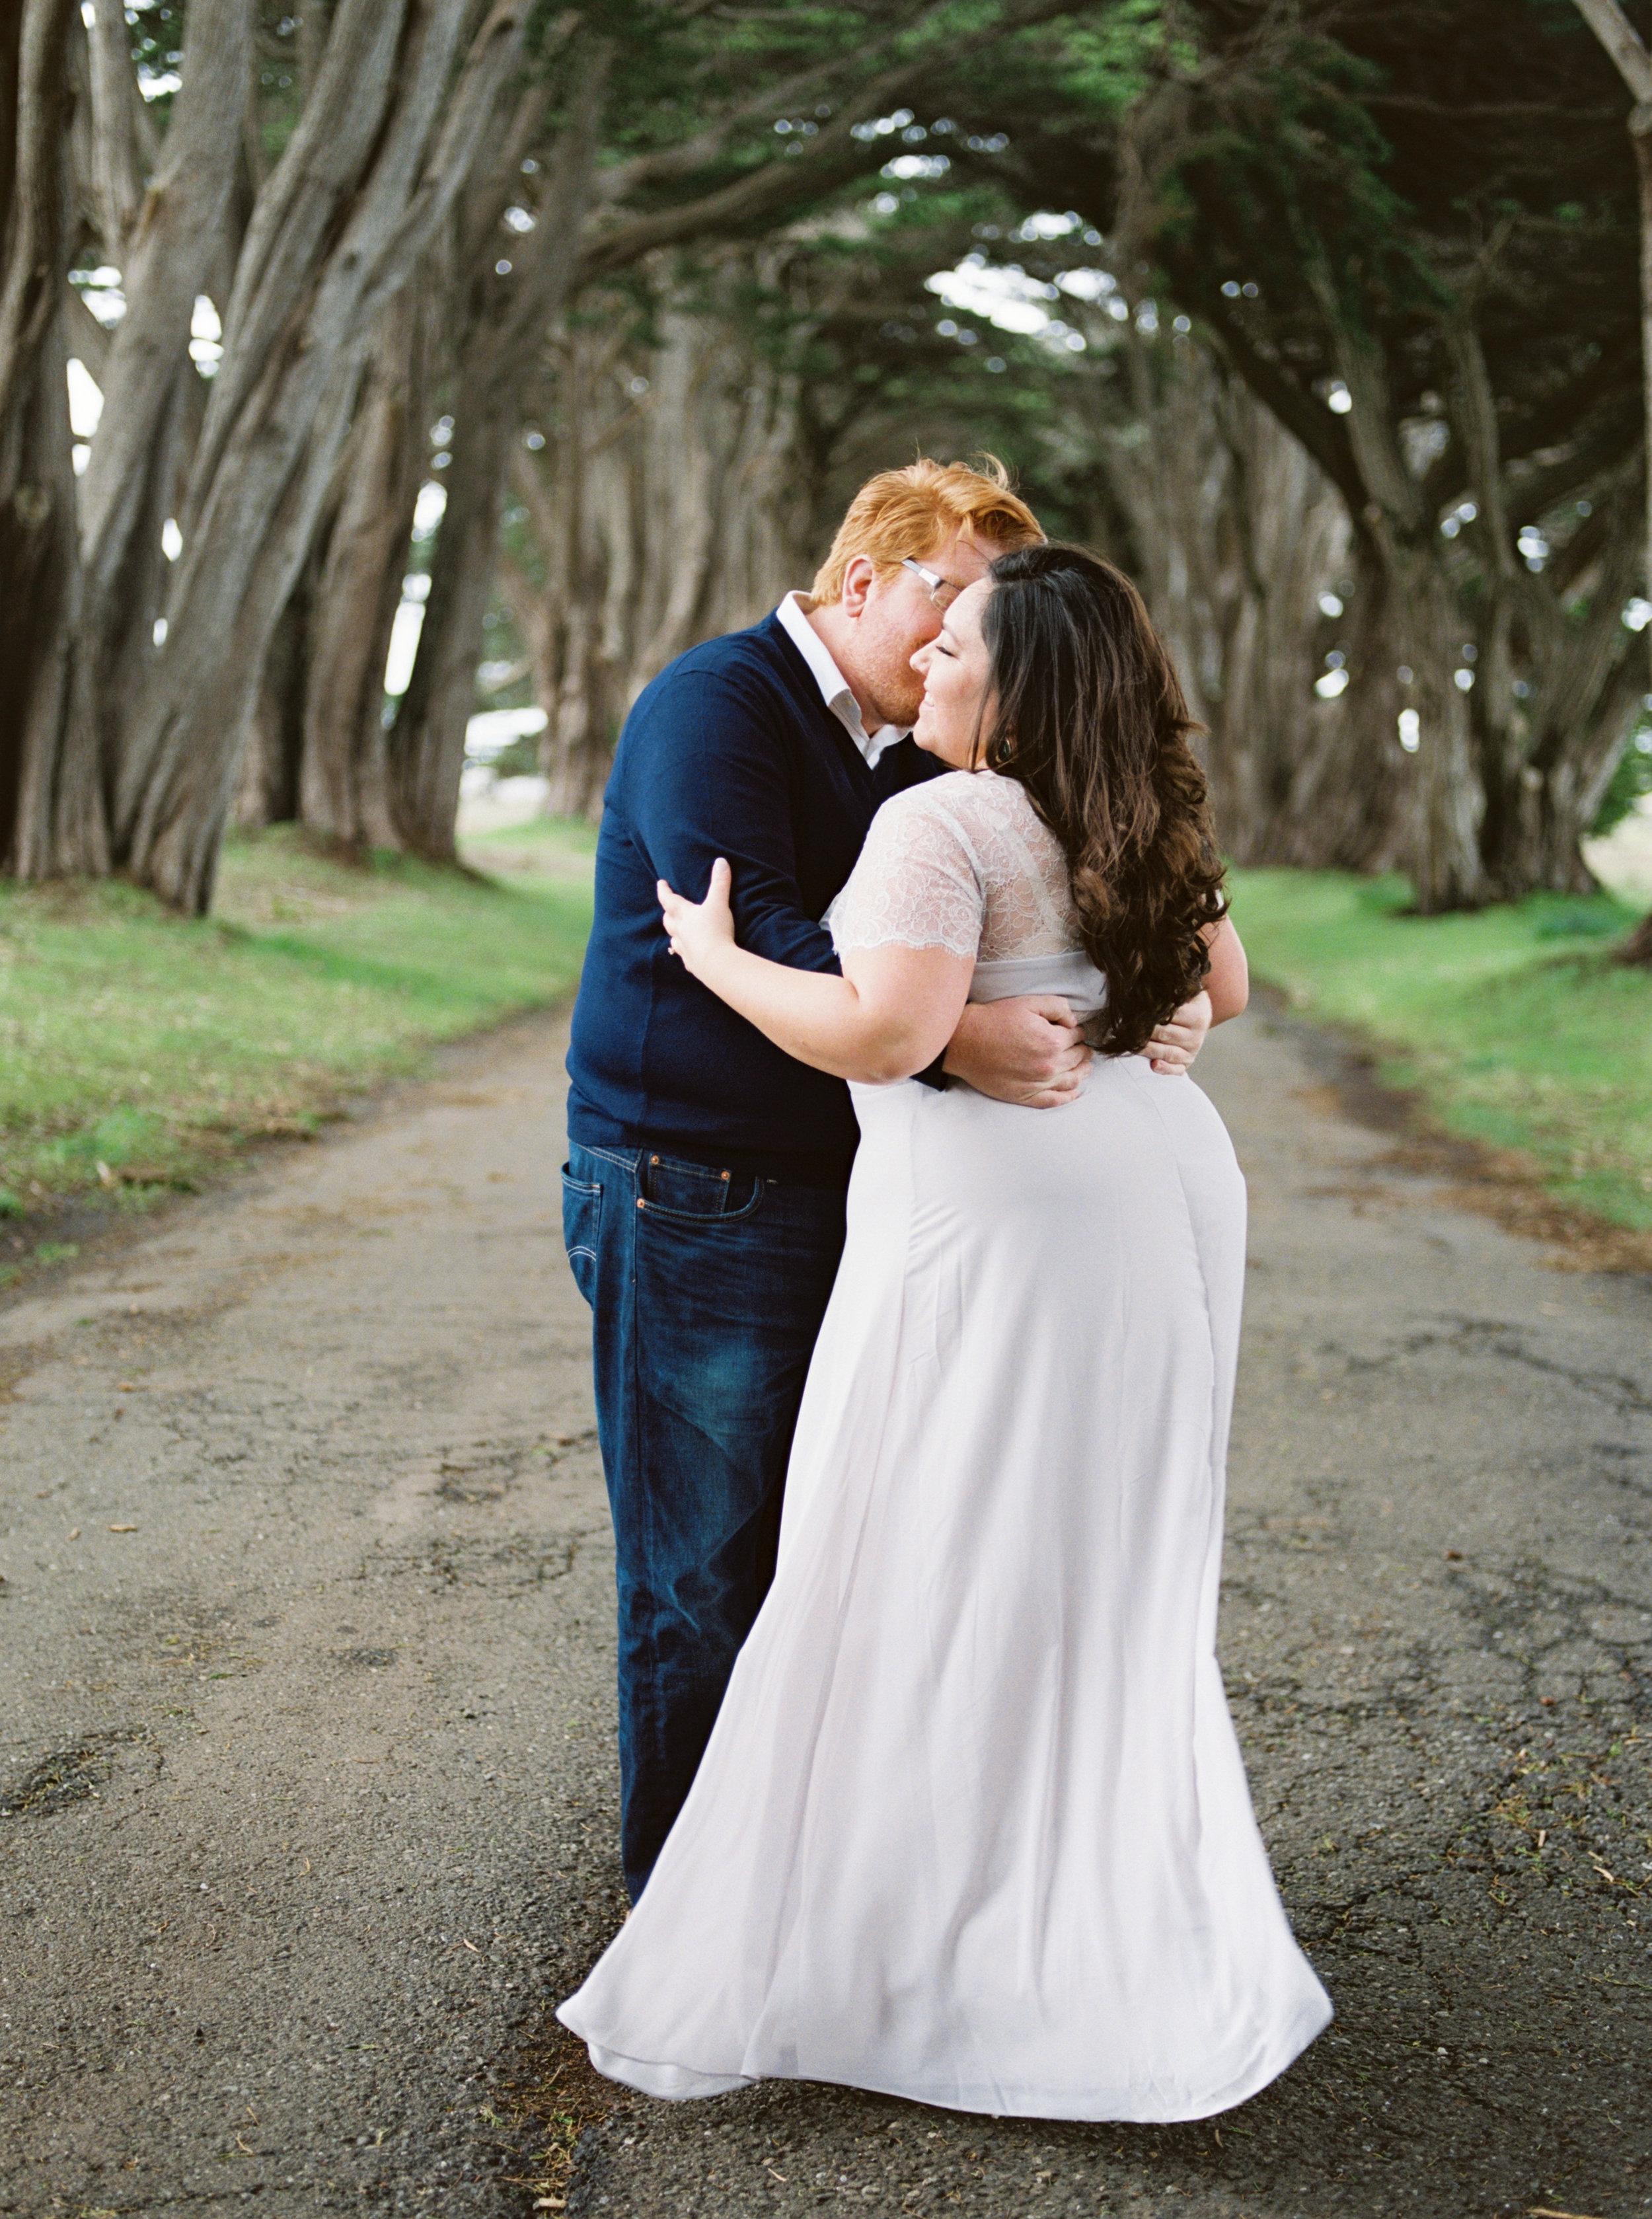 Andrea_and_Josh_Engagement_57.jpg